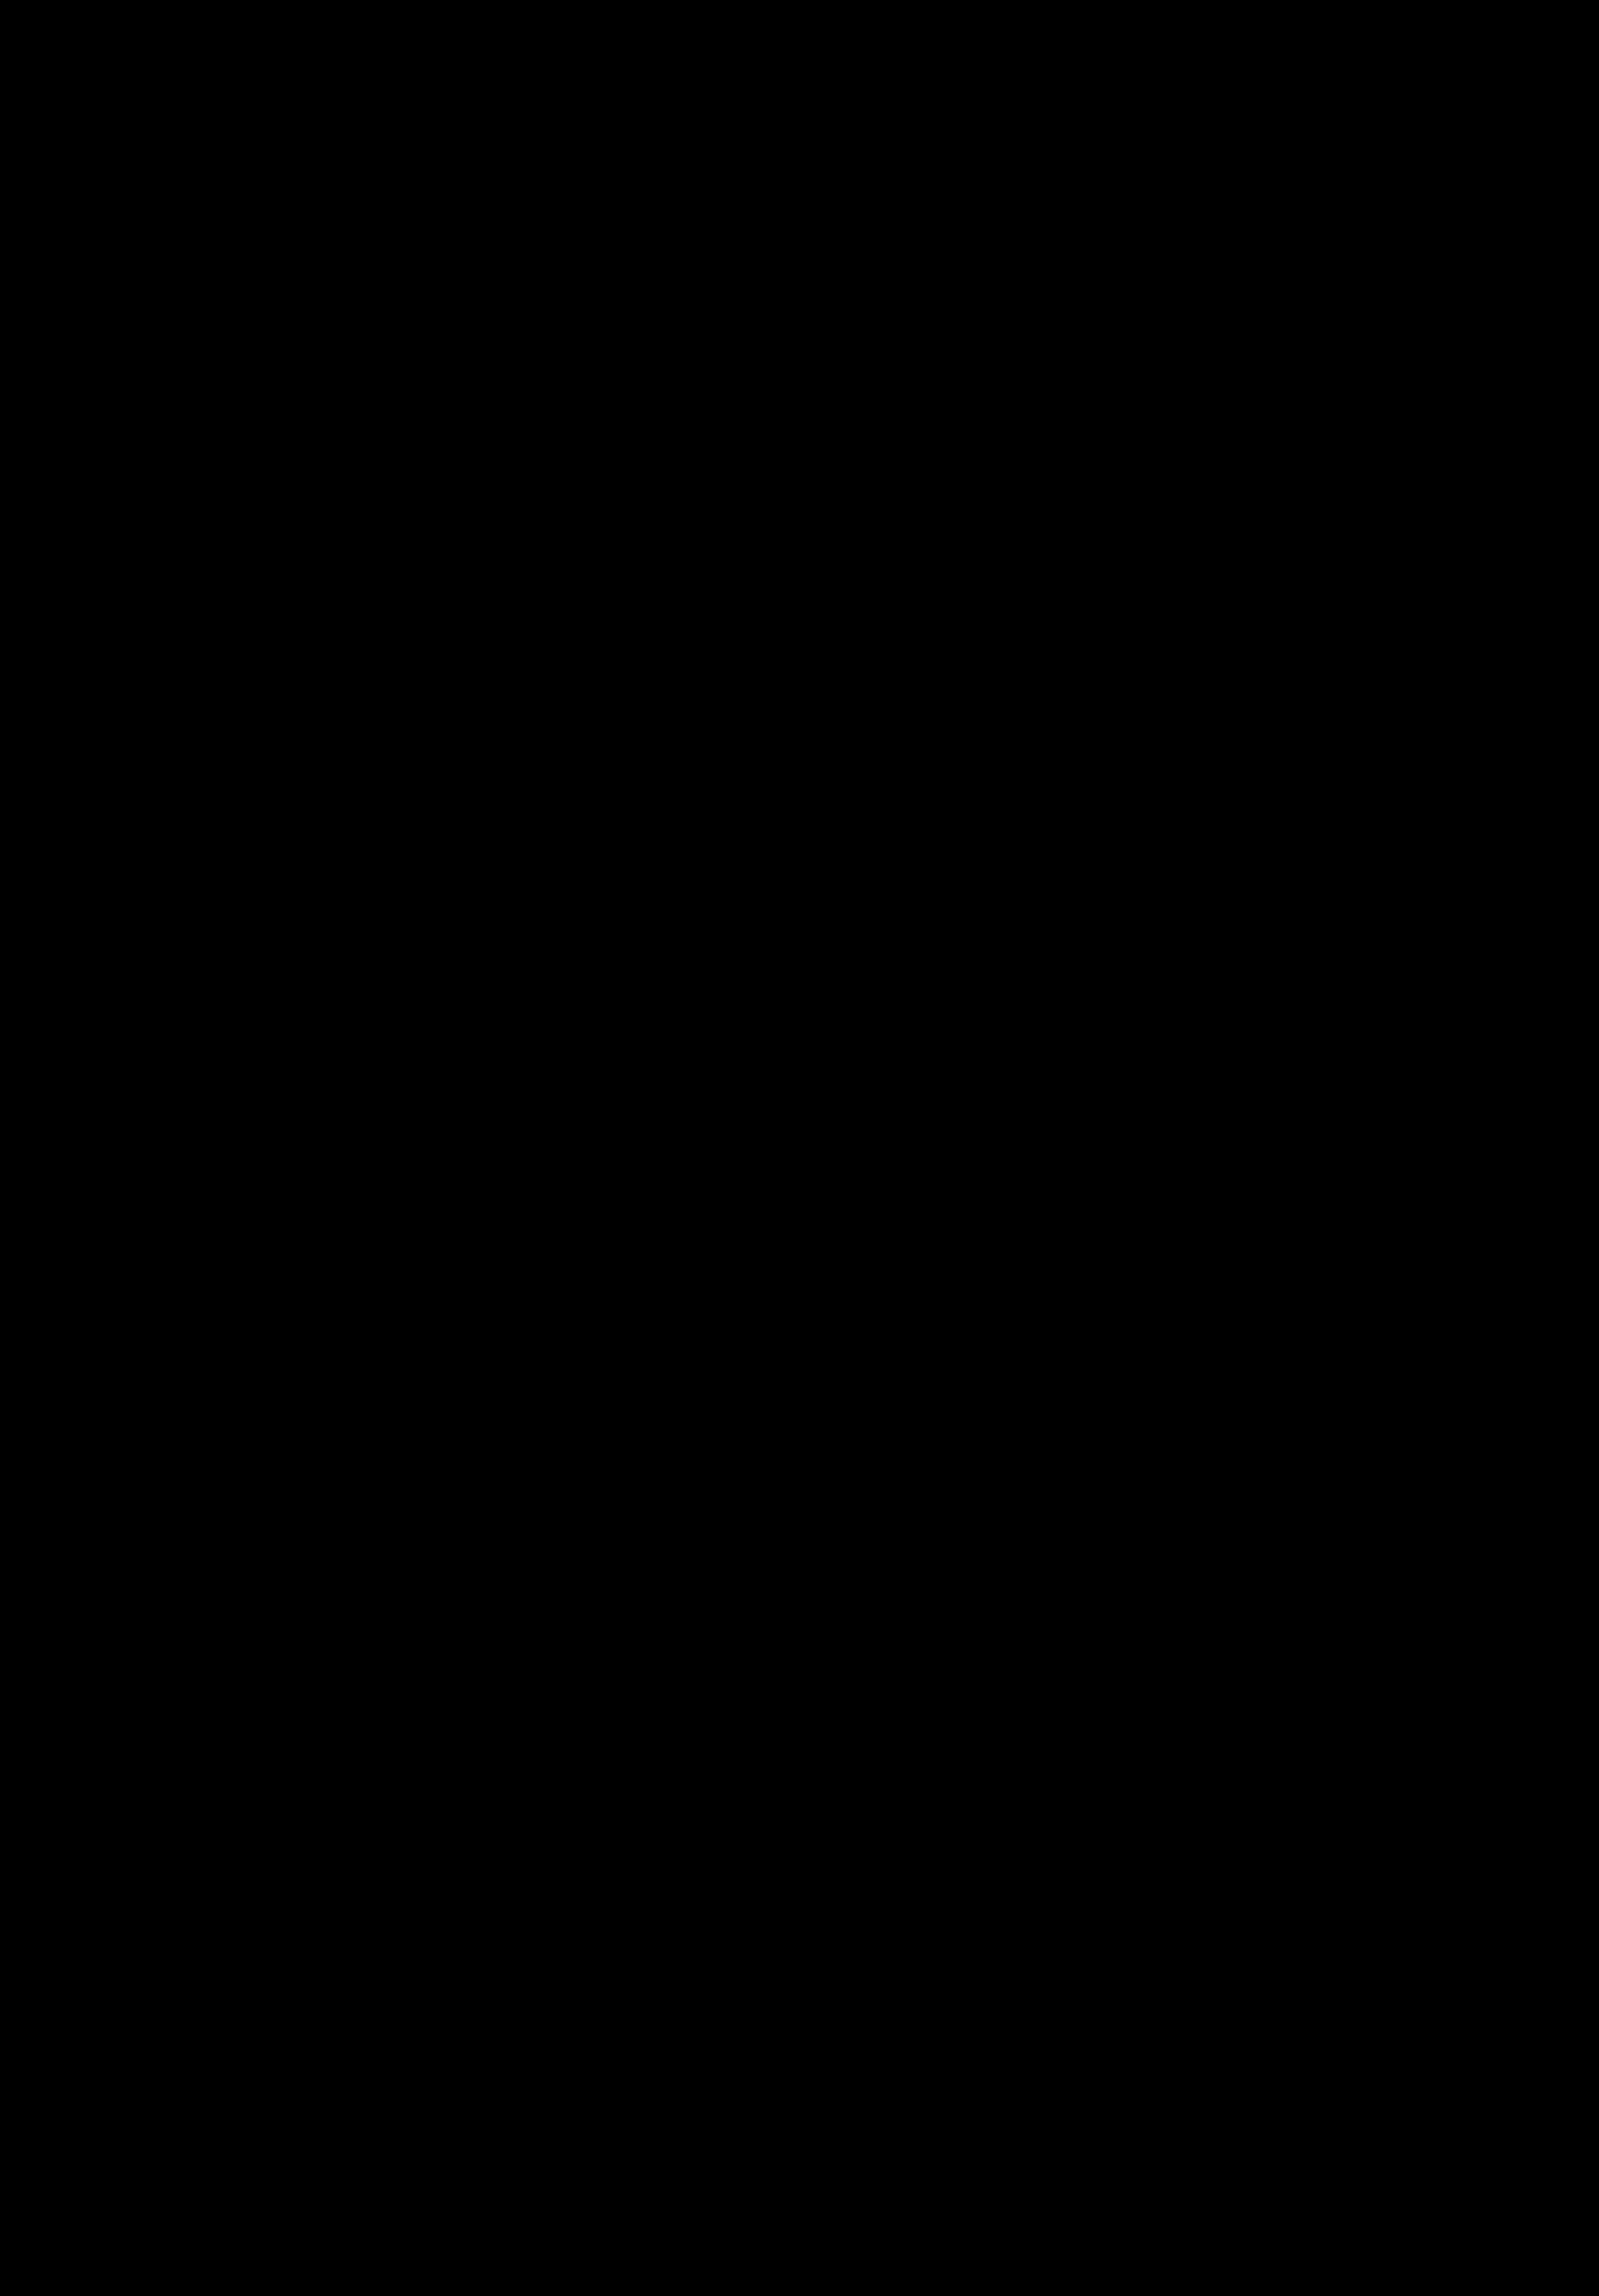 1604 x 2303 png 46kBPeace